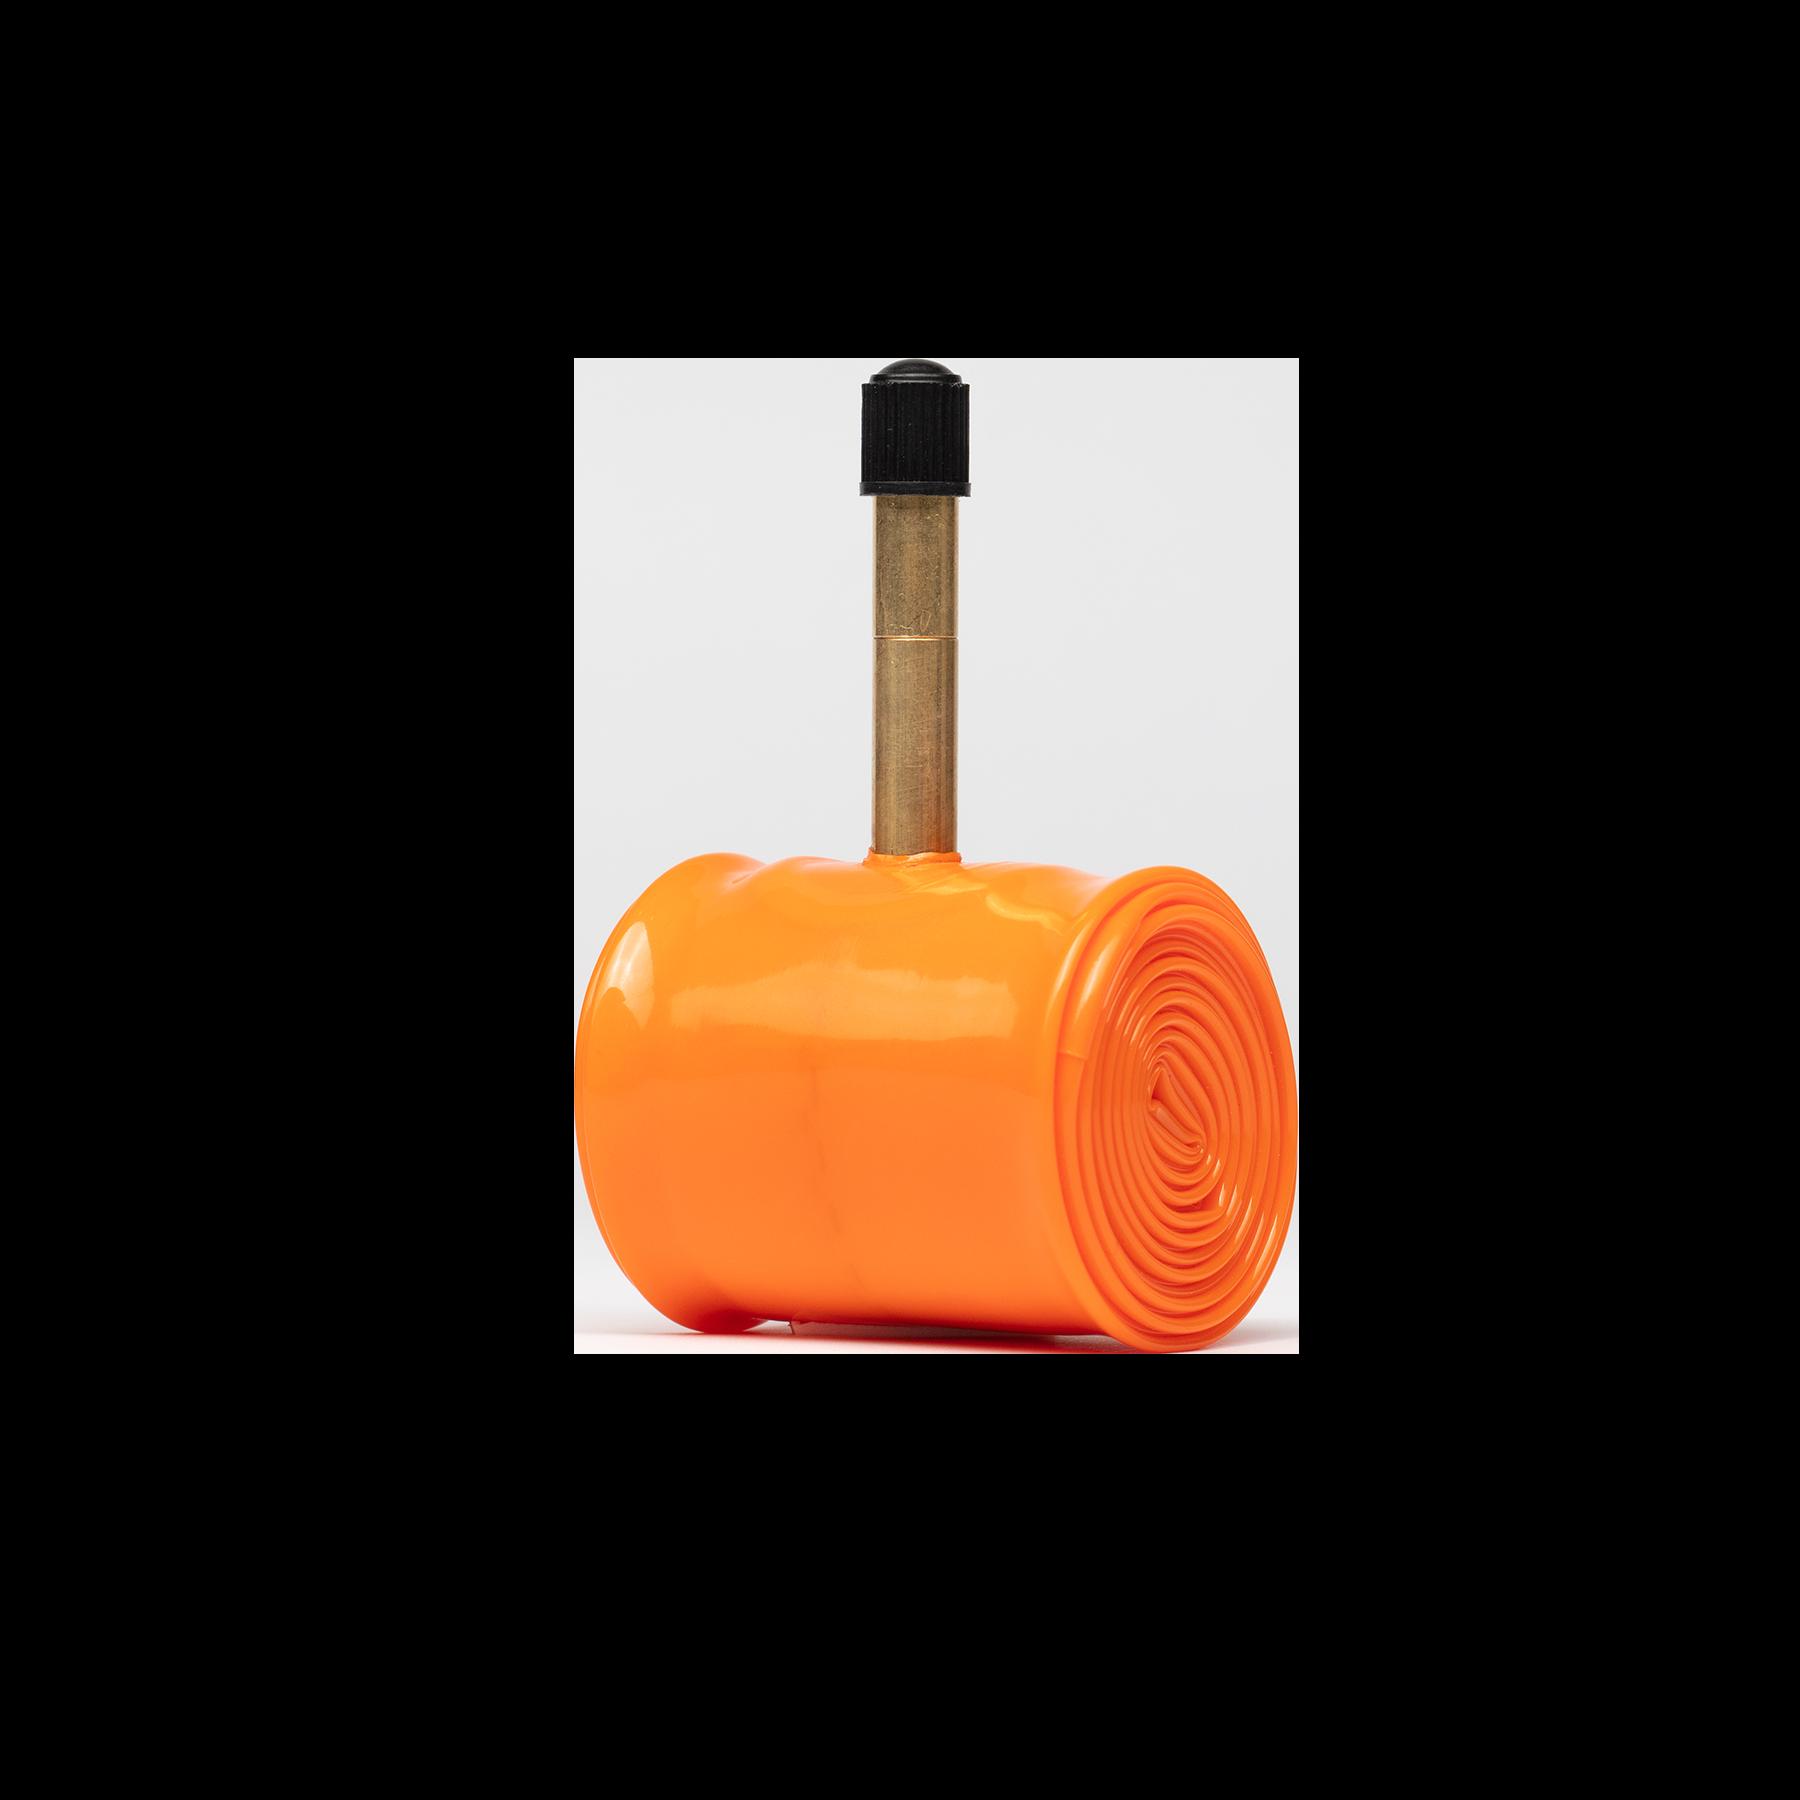 Tubolito Tubo-BMX Tube